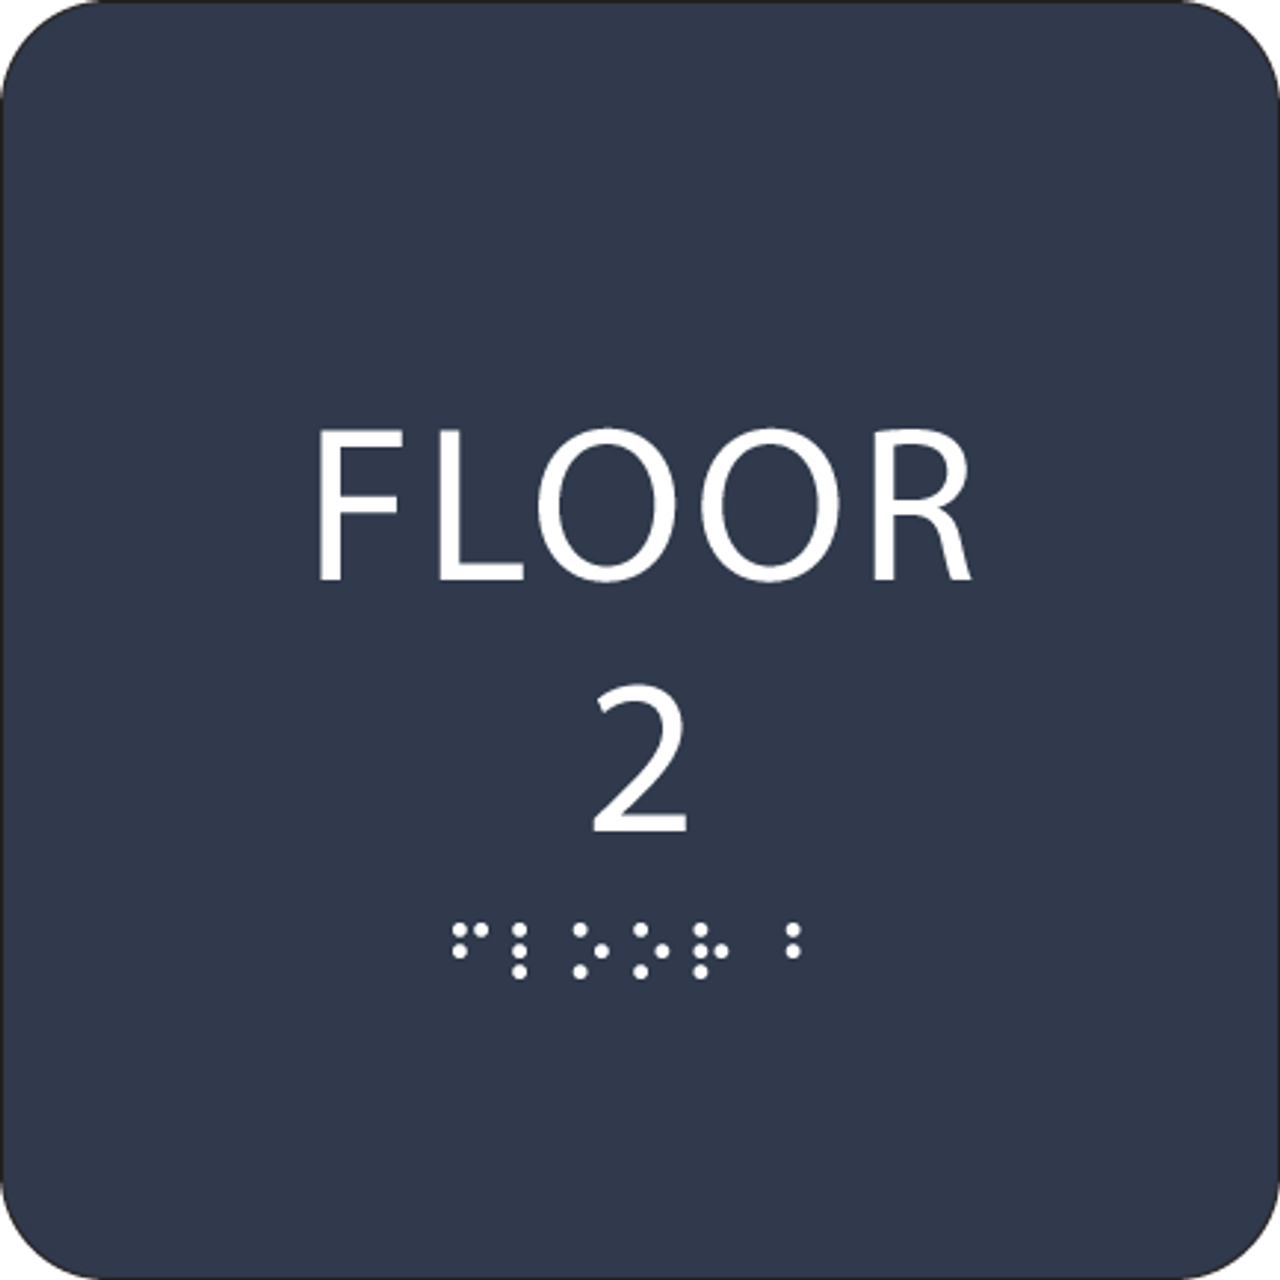 Navy Floor 2 Identification Sign